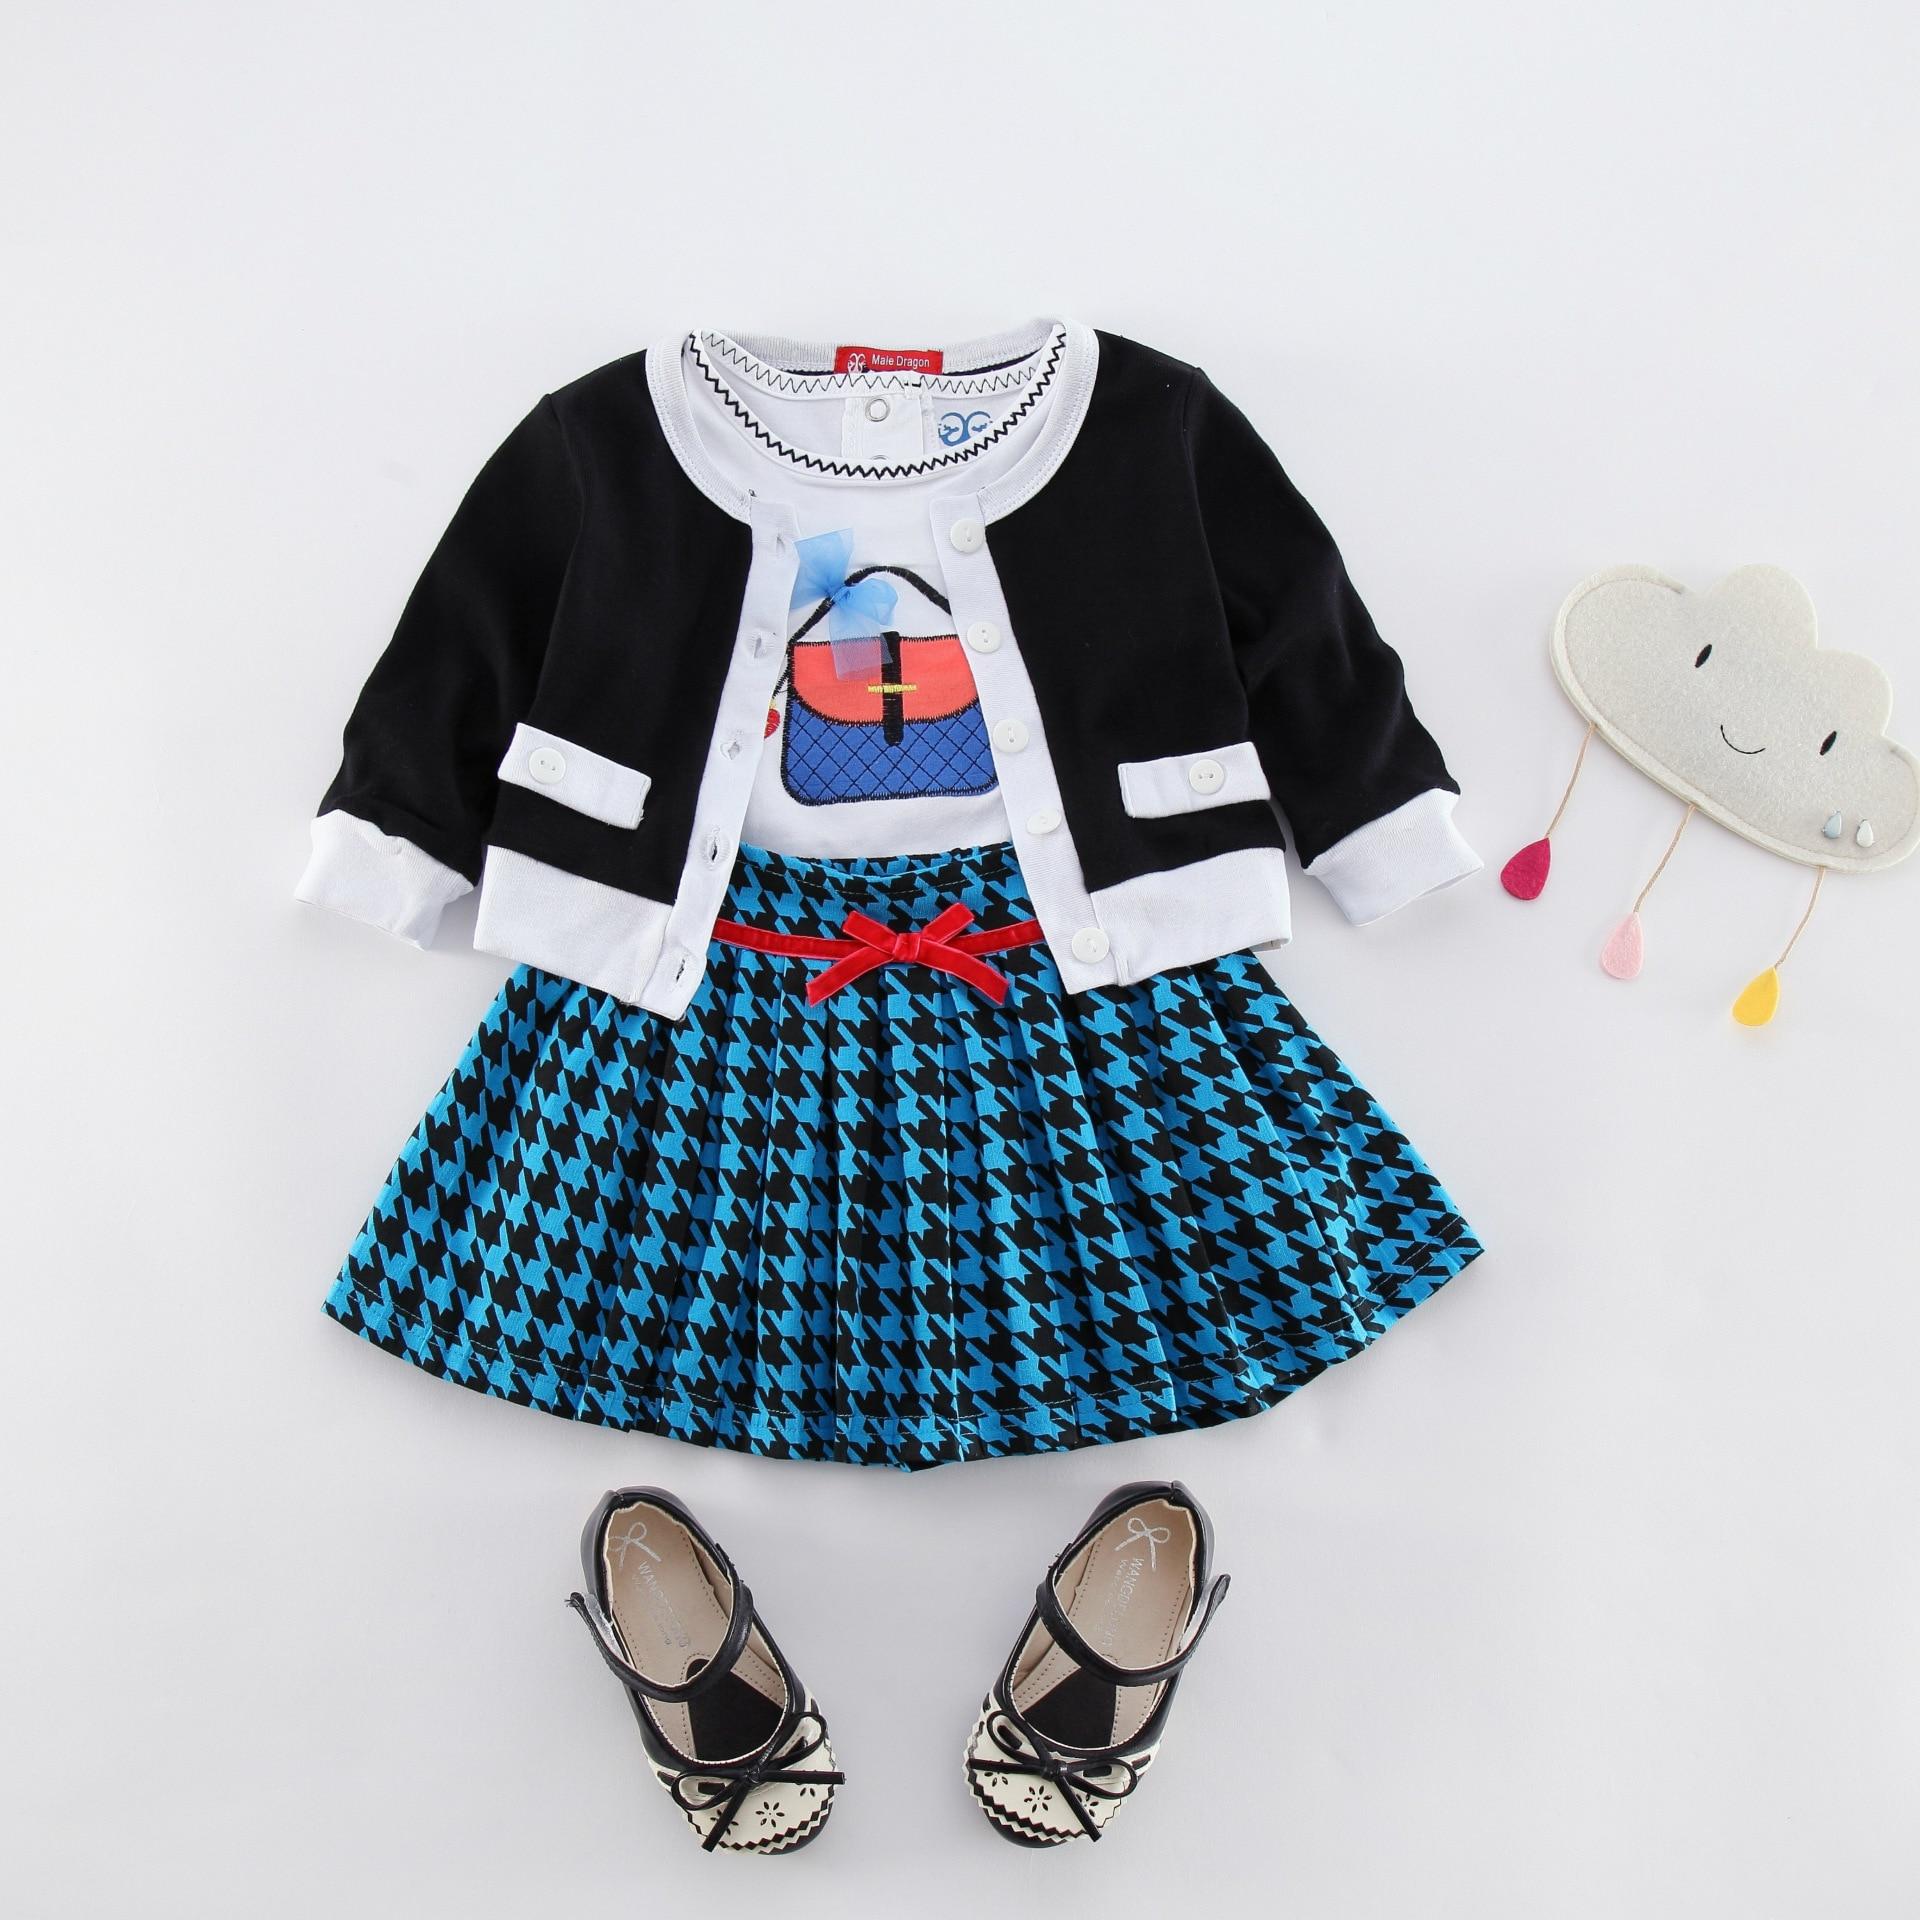 kids clothes brands atuumn kids skirt suit girl full girls clothing